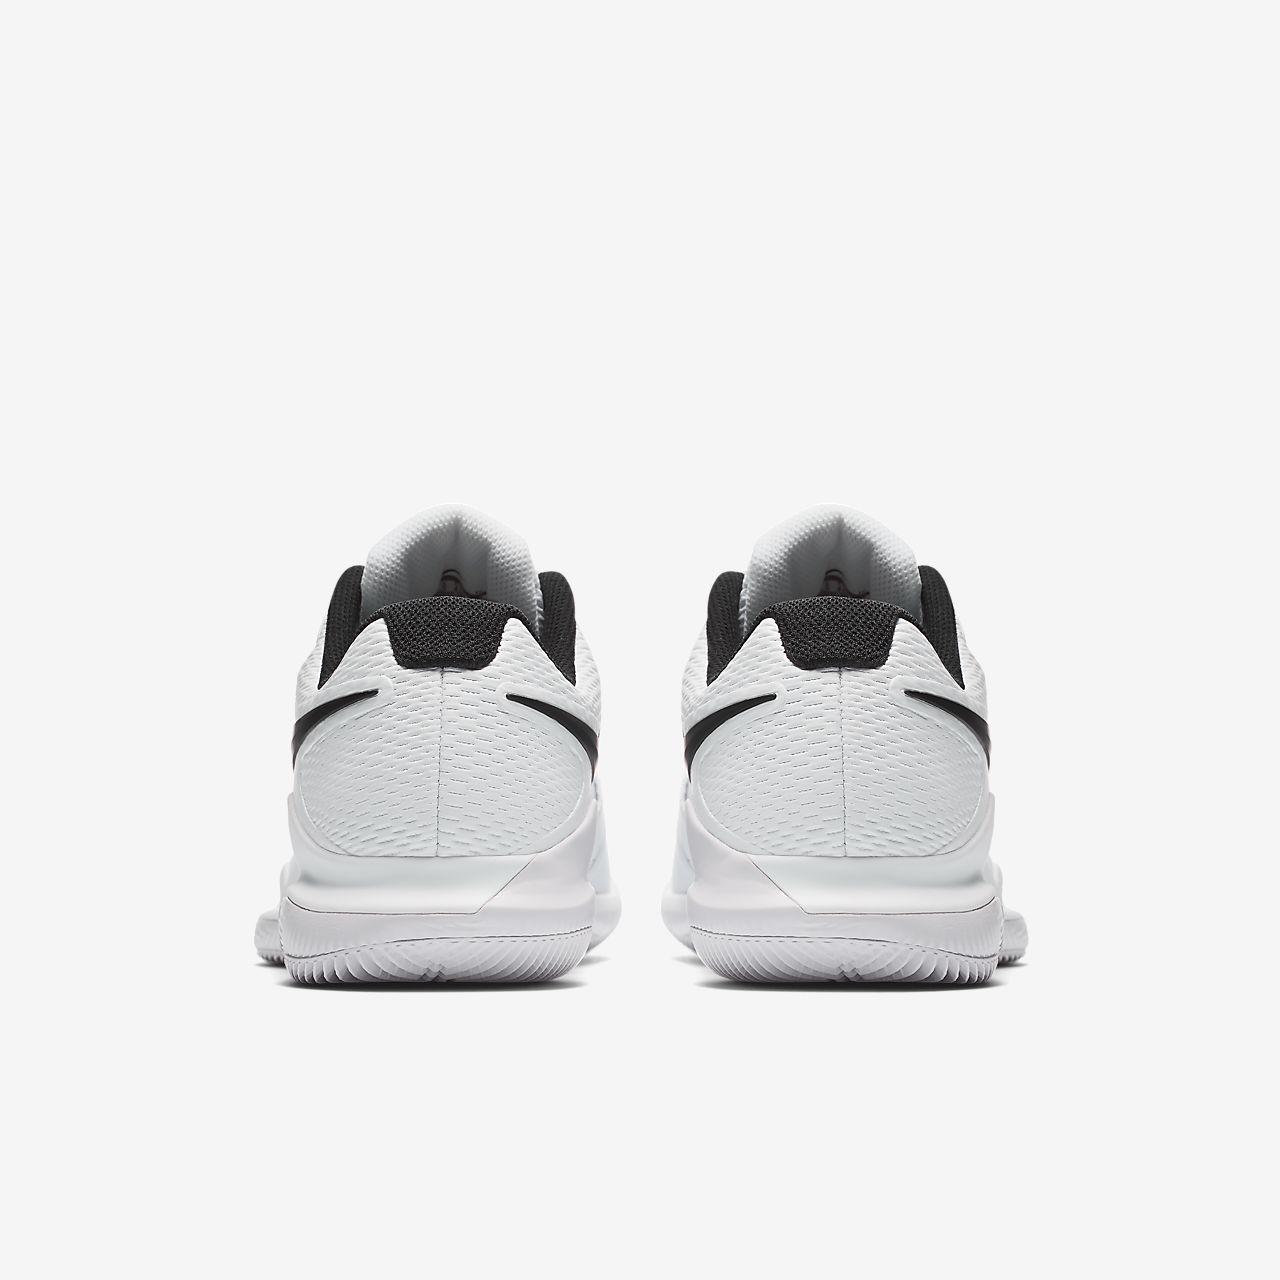 5b1edf0c84278 Nike Air Zoom Vapor X HC Men's Tennis Shoe. Nike.com AU